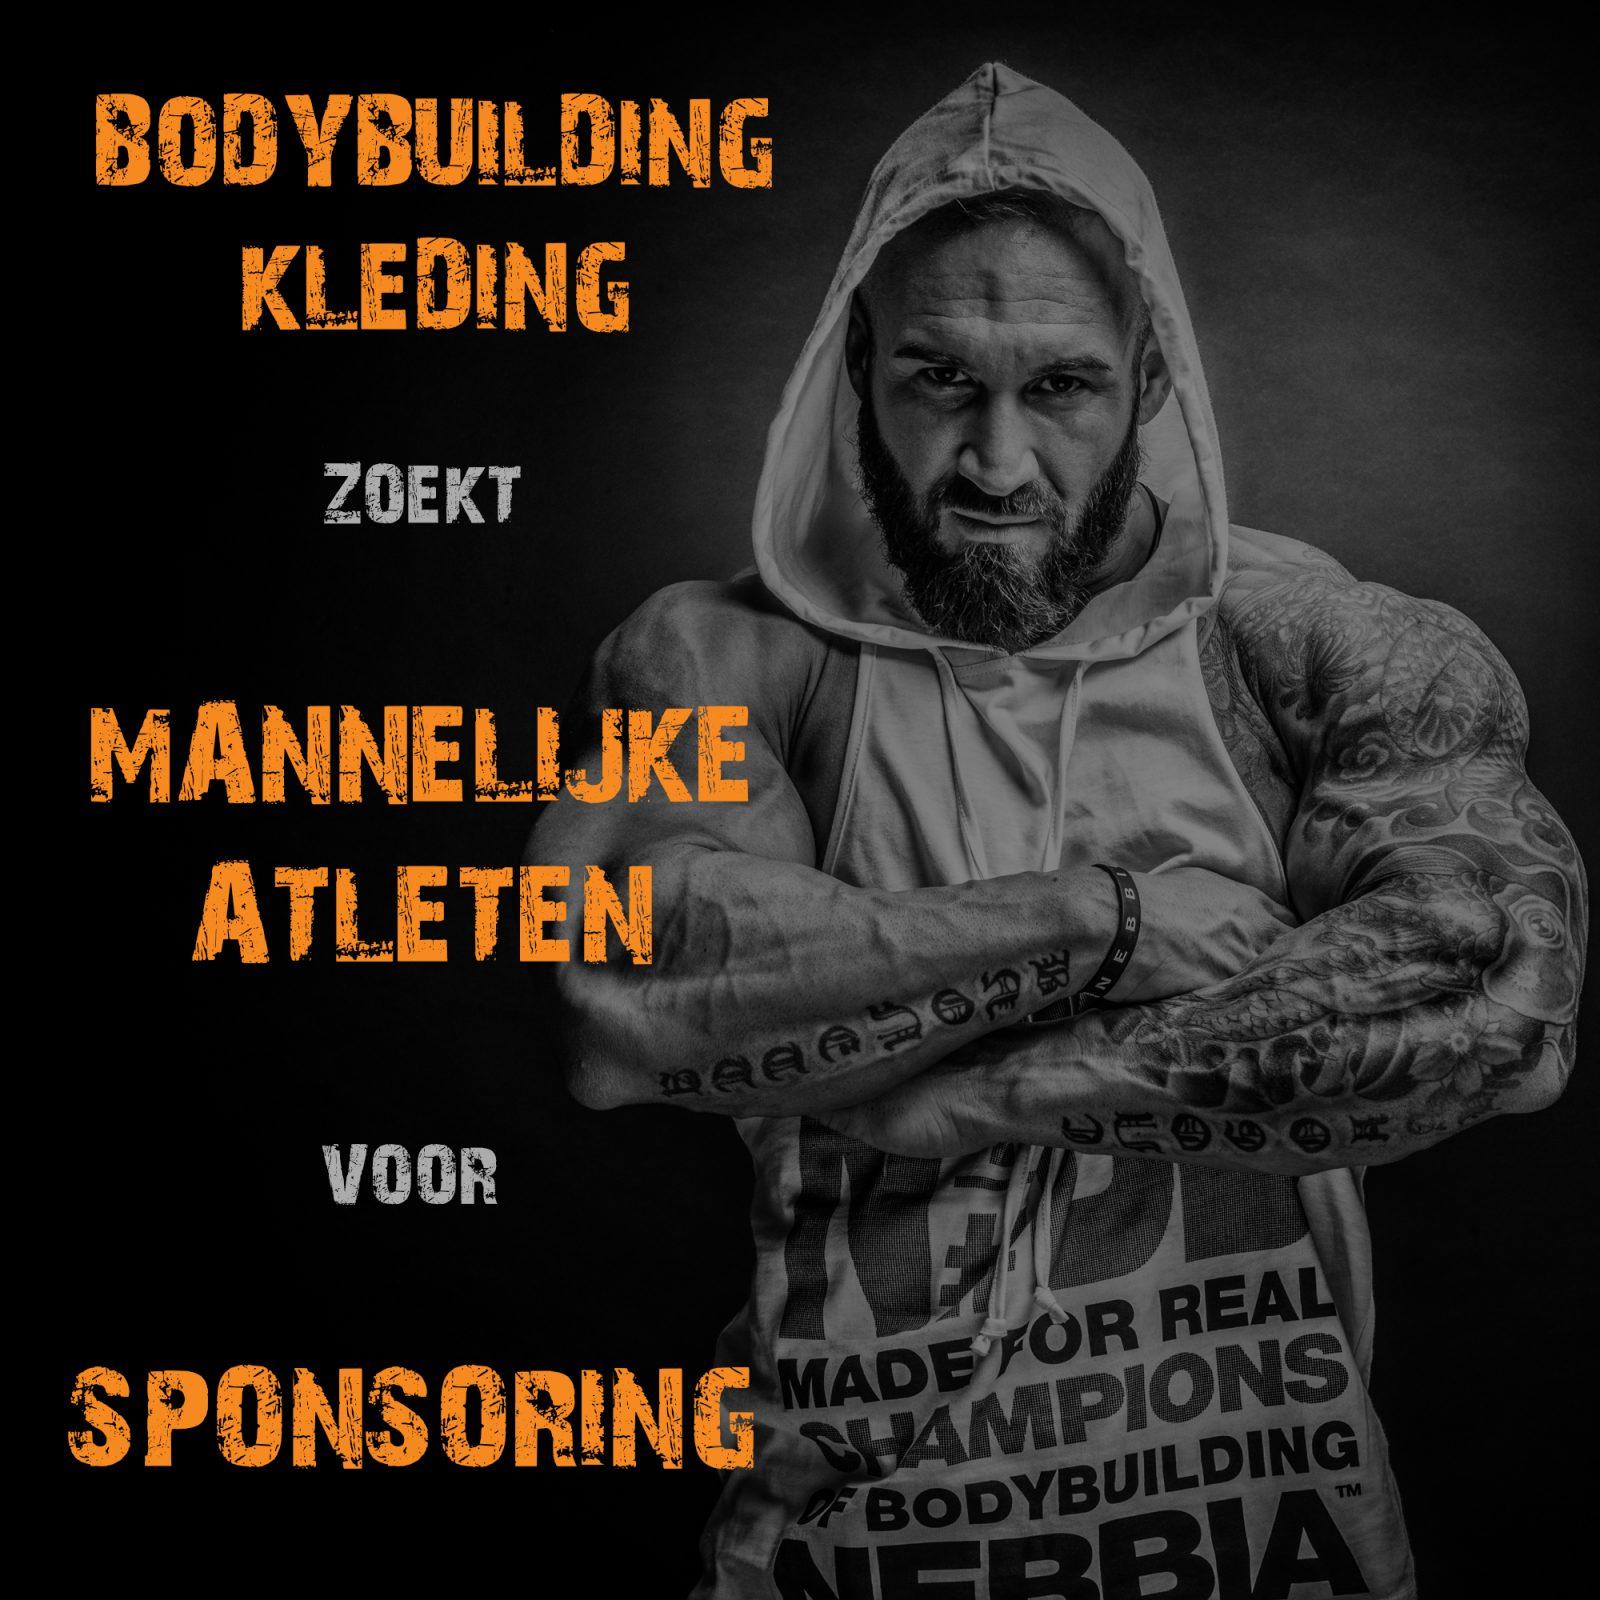 Bodybuilding Kleding sponsoring mannelijke bodybuilding atleten